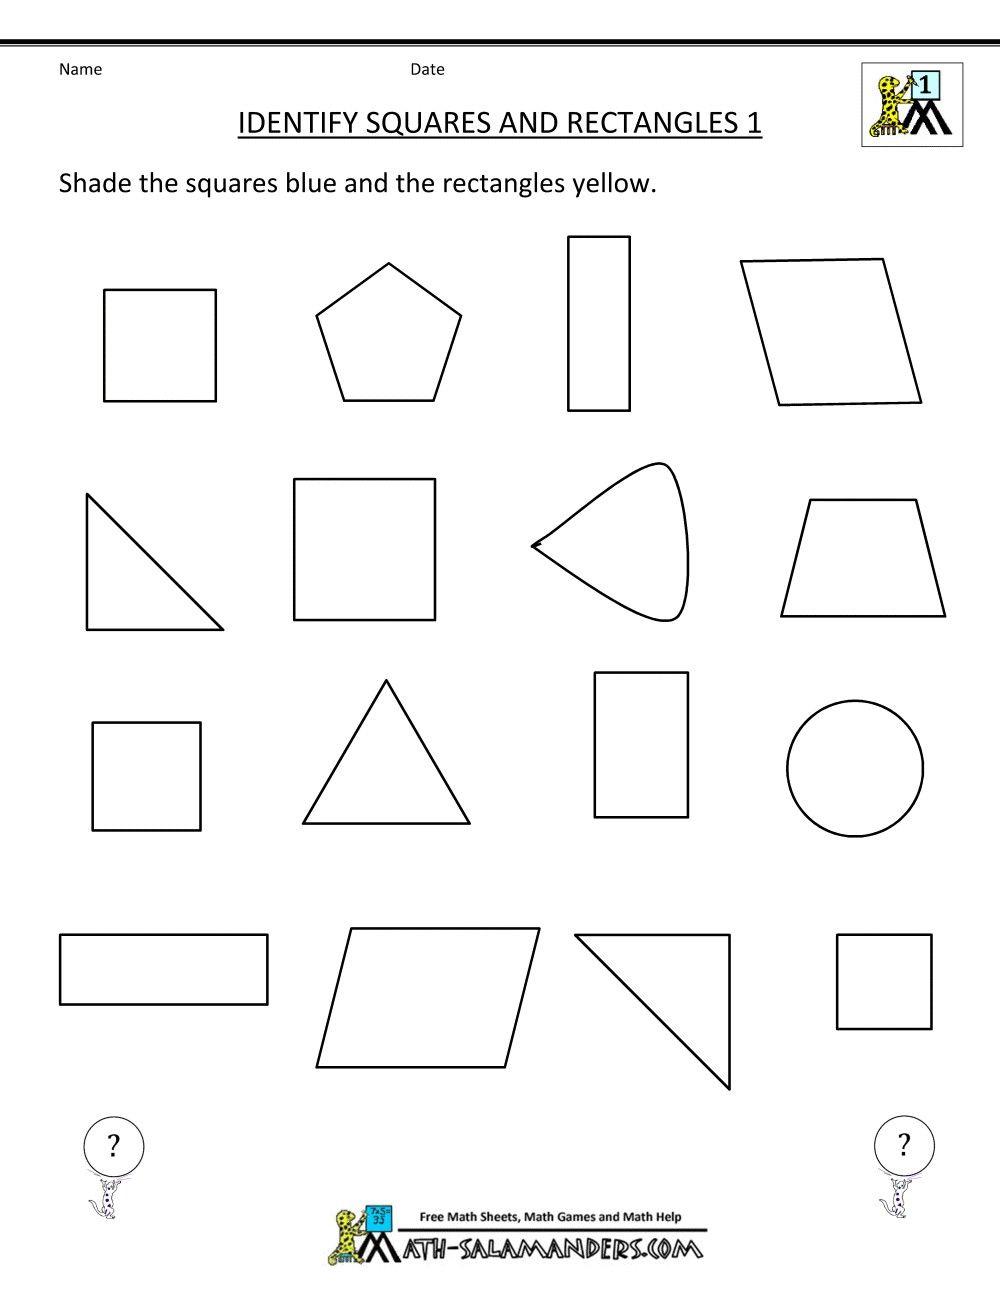 3 Worksheet Free Math Worksheets First Grade 1 Fractions First Grade Geometry 1st Grade Math Worksheets Math Worksheets Geometry Worksheets